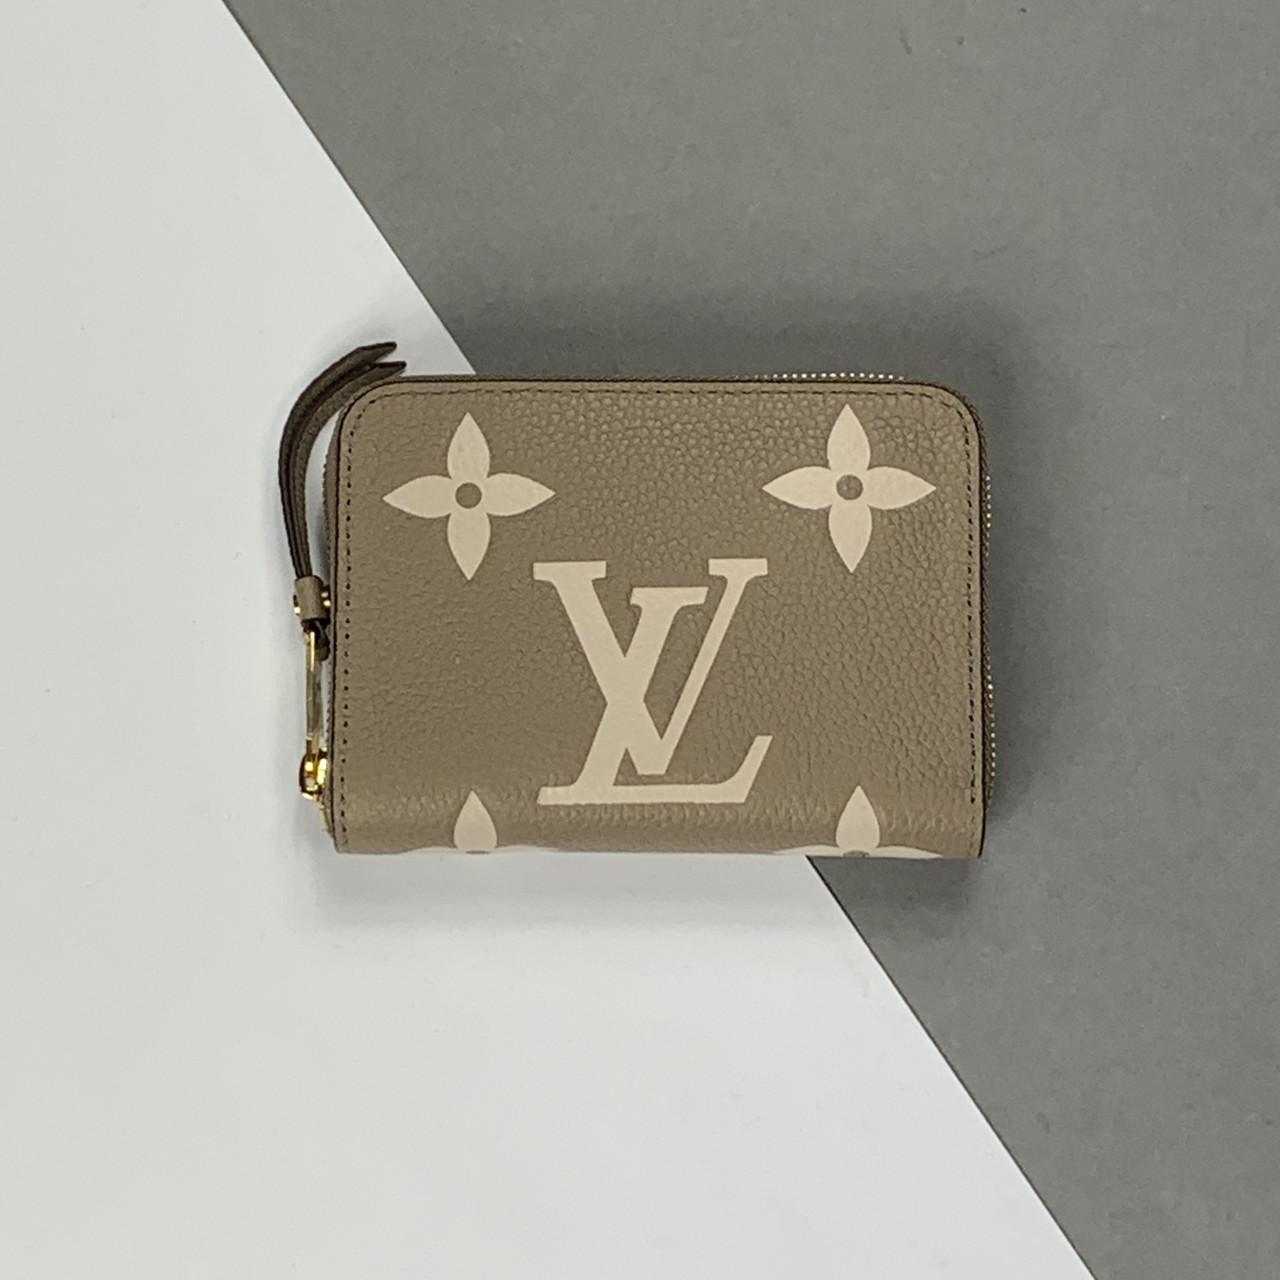 Кошелек Louis Vuitton Zippy Monogram Empreinte бежевый (Луи Виттон Зиппи) арт. 22-153